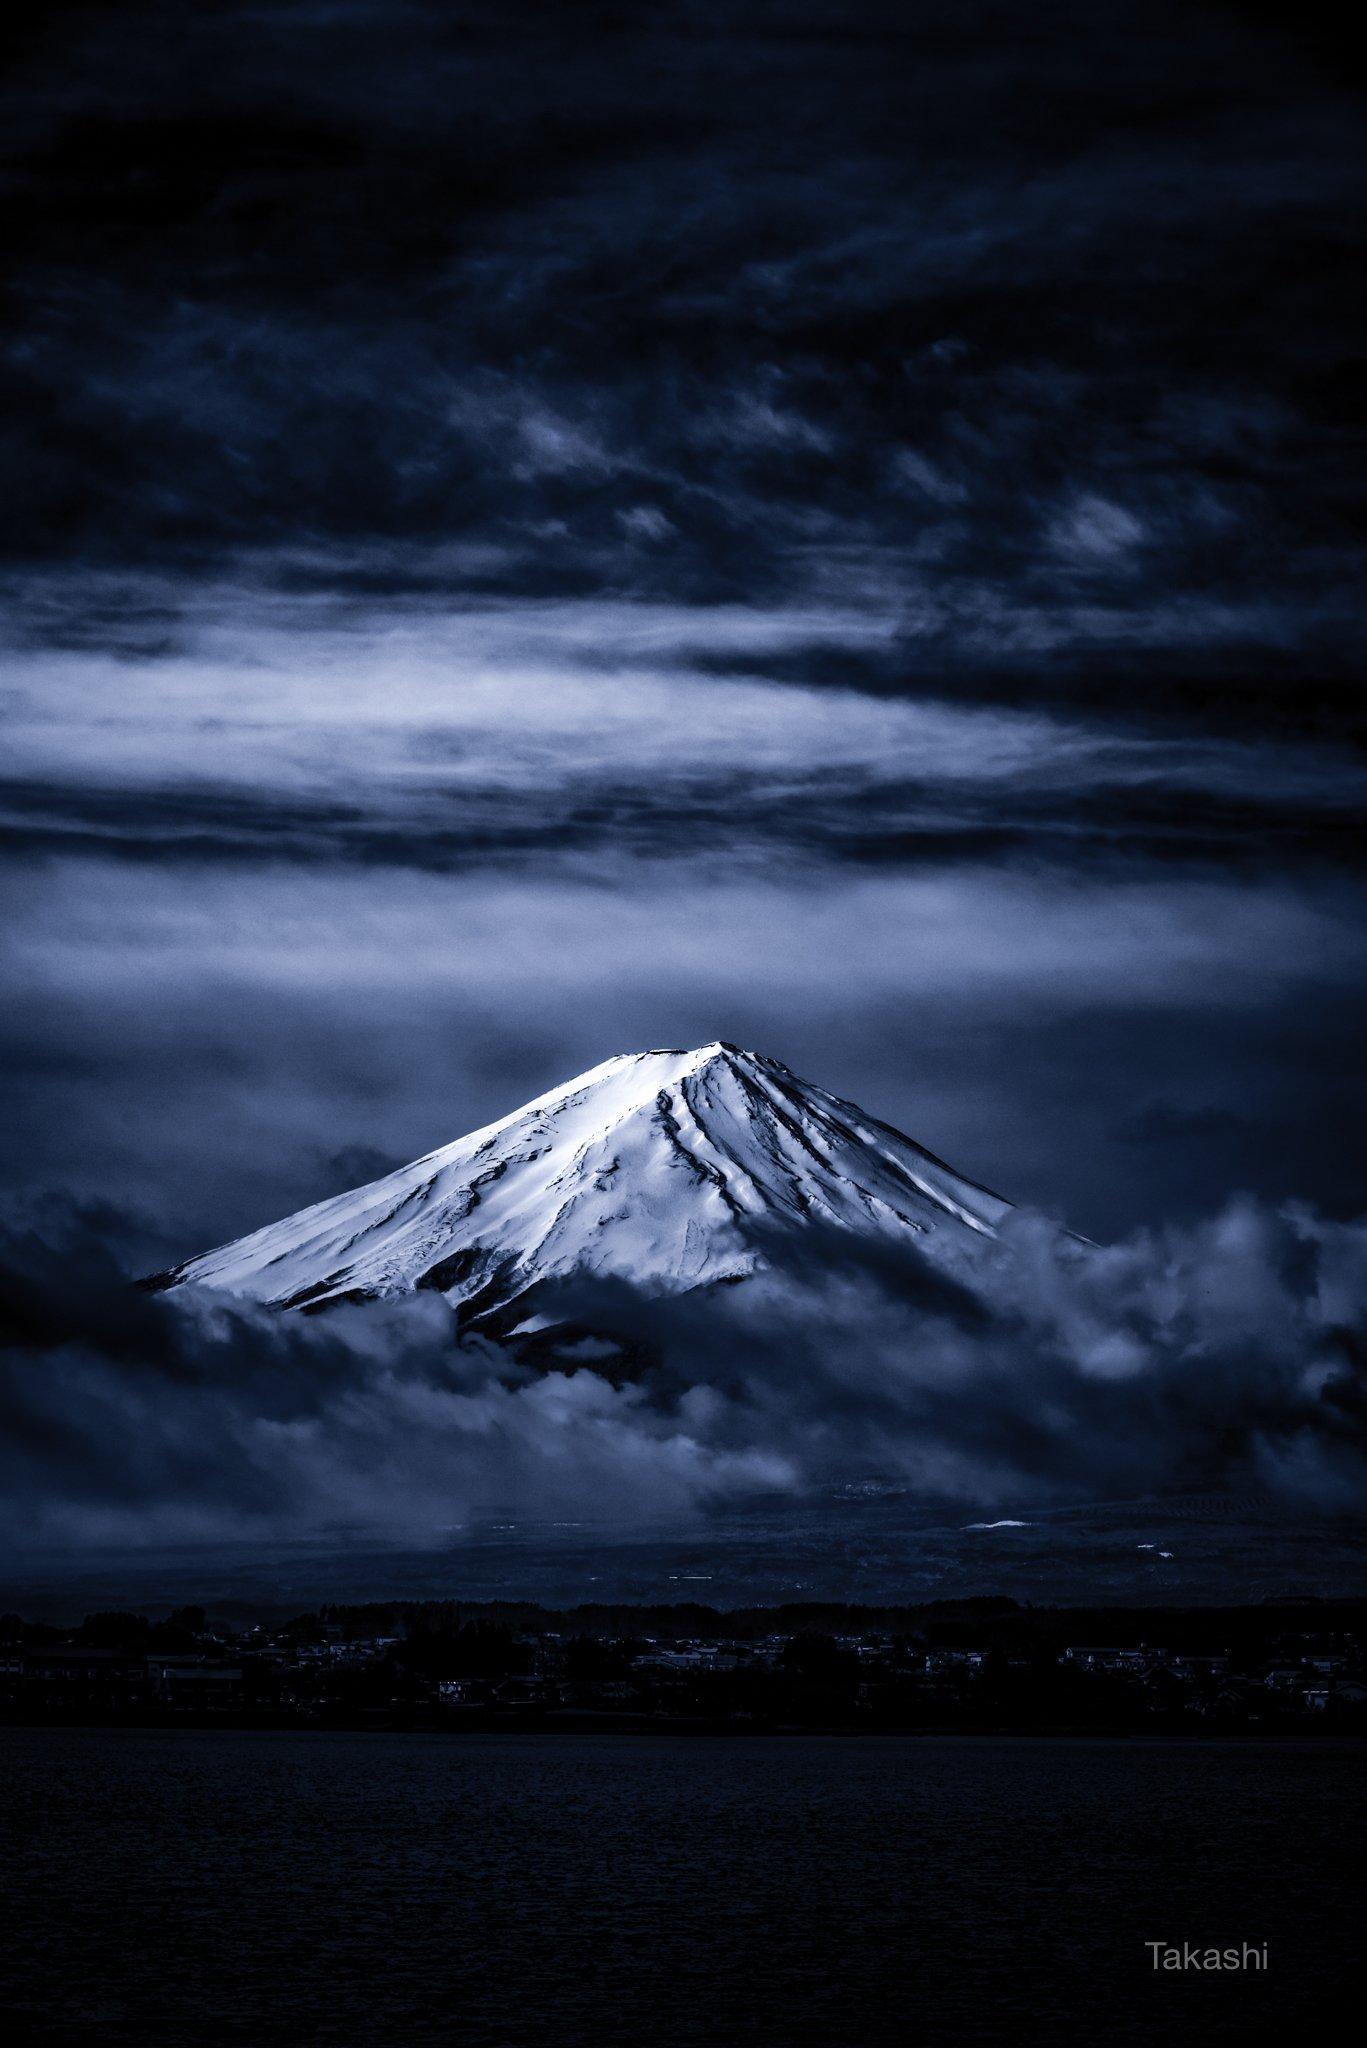 Fuji,mountain,Japan,cloud,snow,white,blue,sky,beautiful,sky,amazing,, Takashi